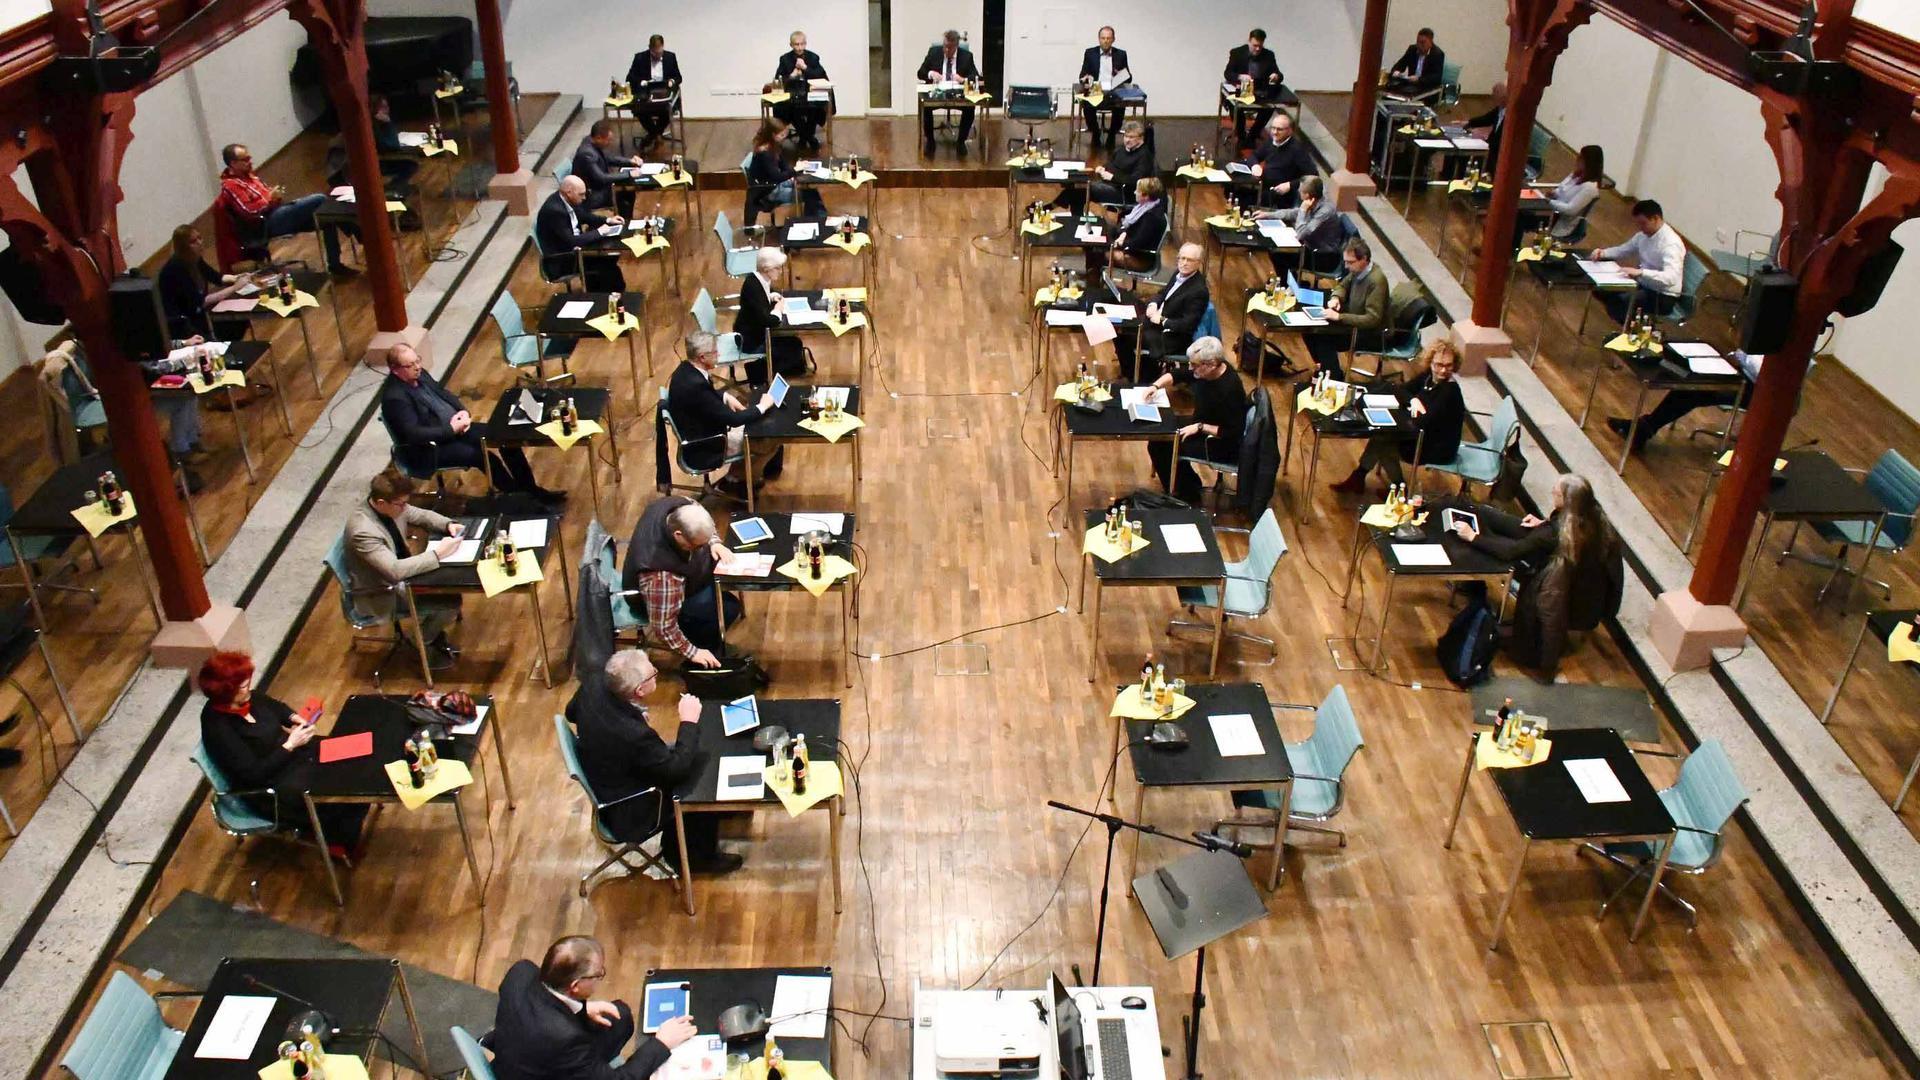 Gemeinderatsitzung Bühl 11.03.2020  Corona-Virus